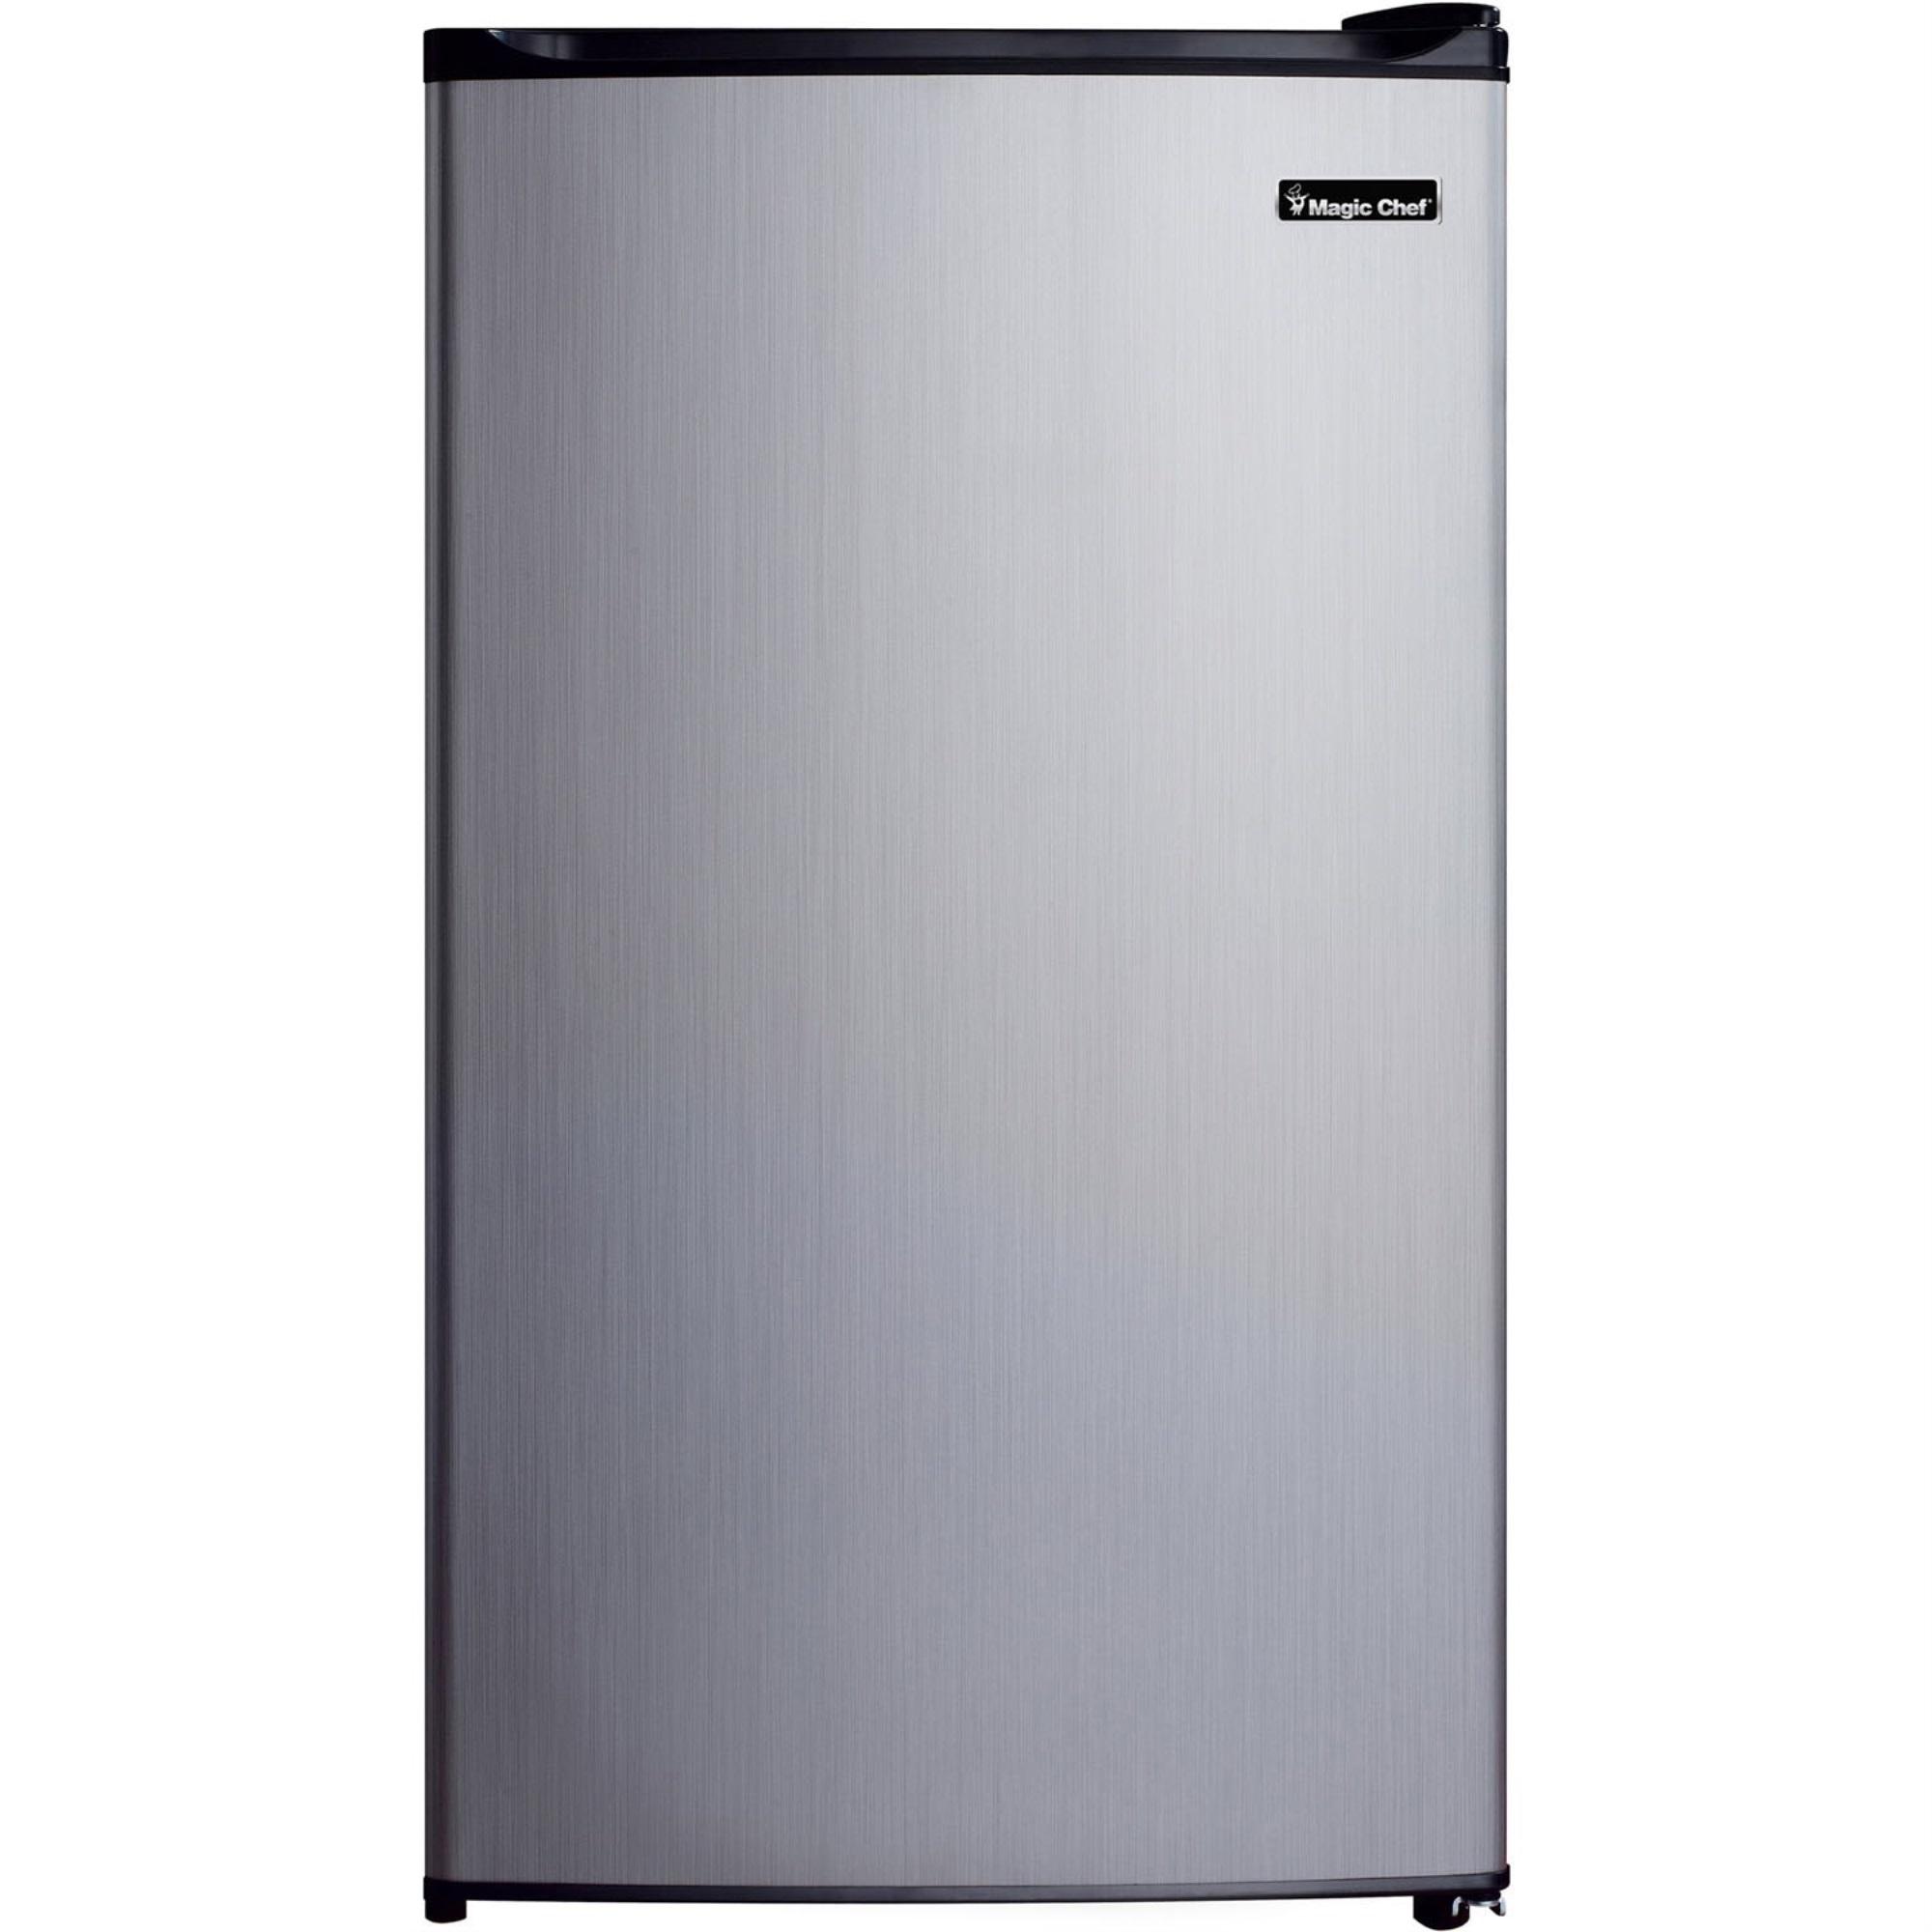 Magic Chef MCBR350S2 3.5 Cu. Ft. Refrigerator with Full-Widt